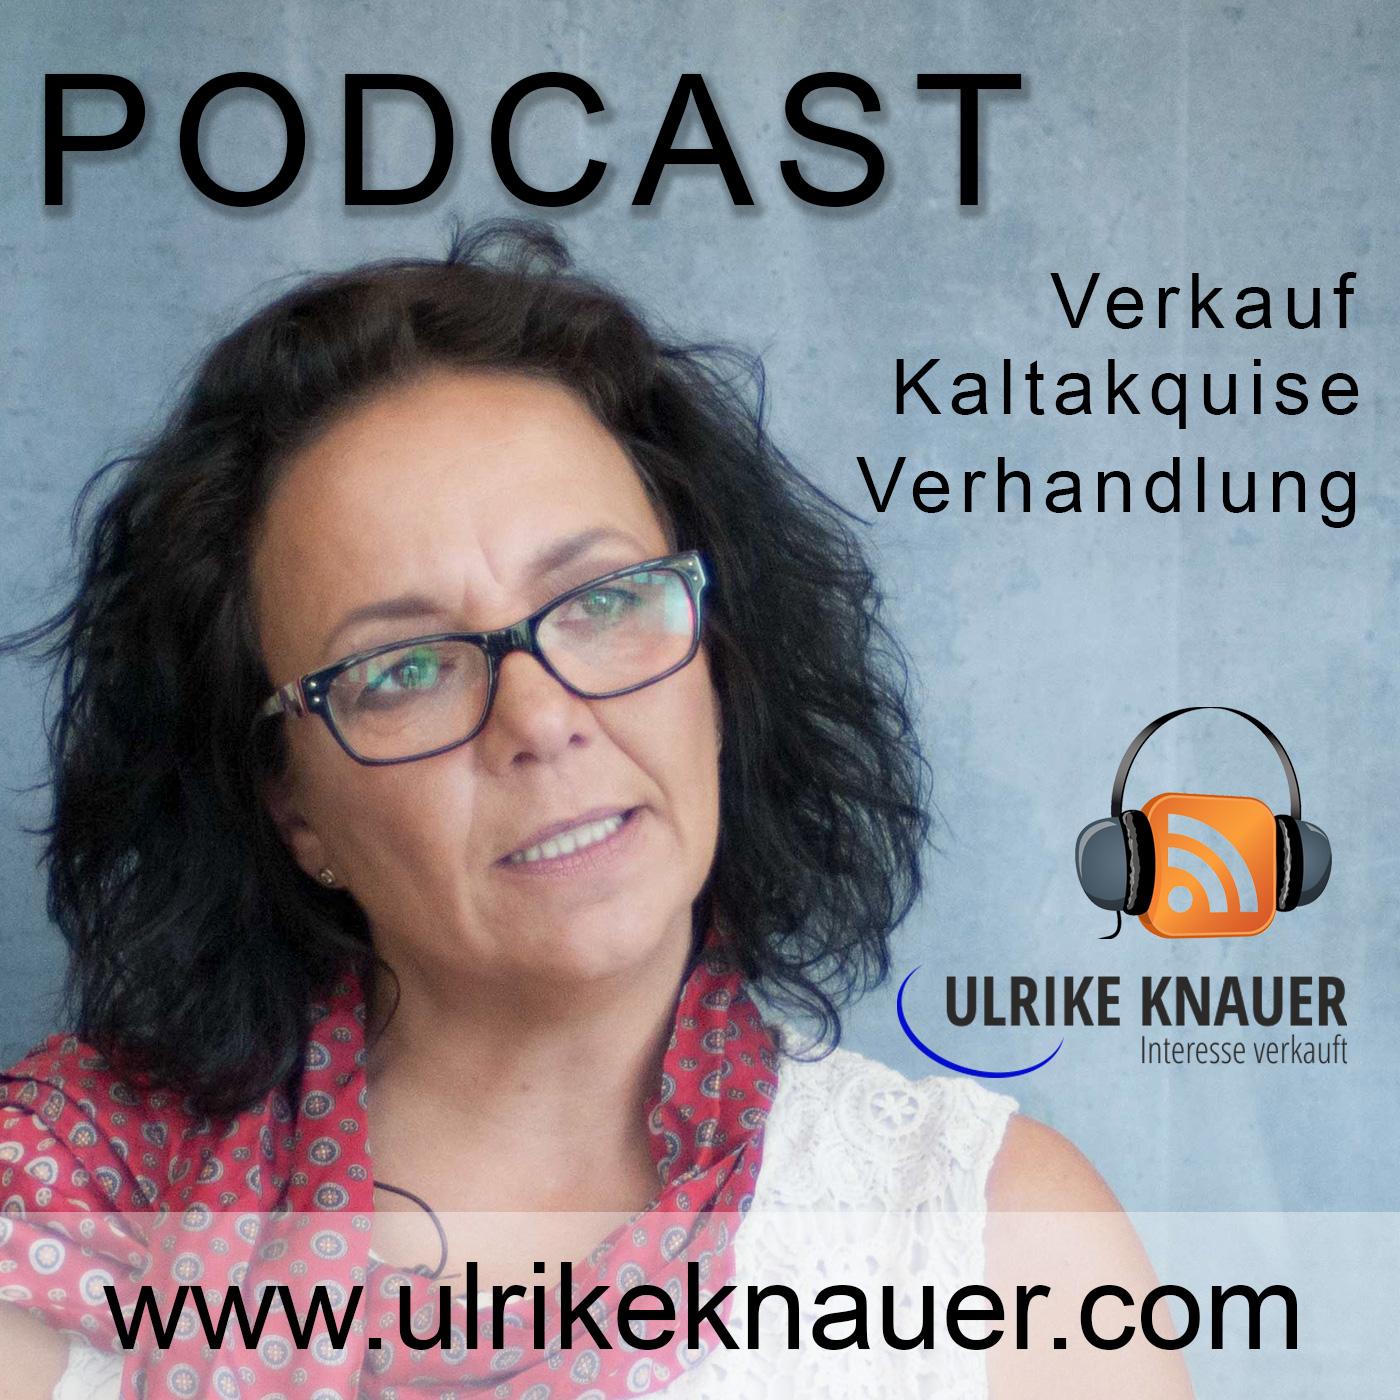 Podcast Verkauf Verhandlung Preisverhandlung logo